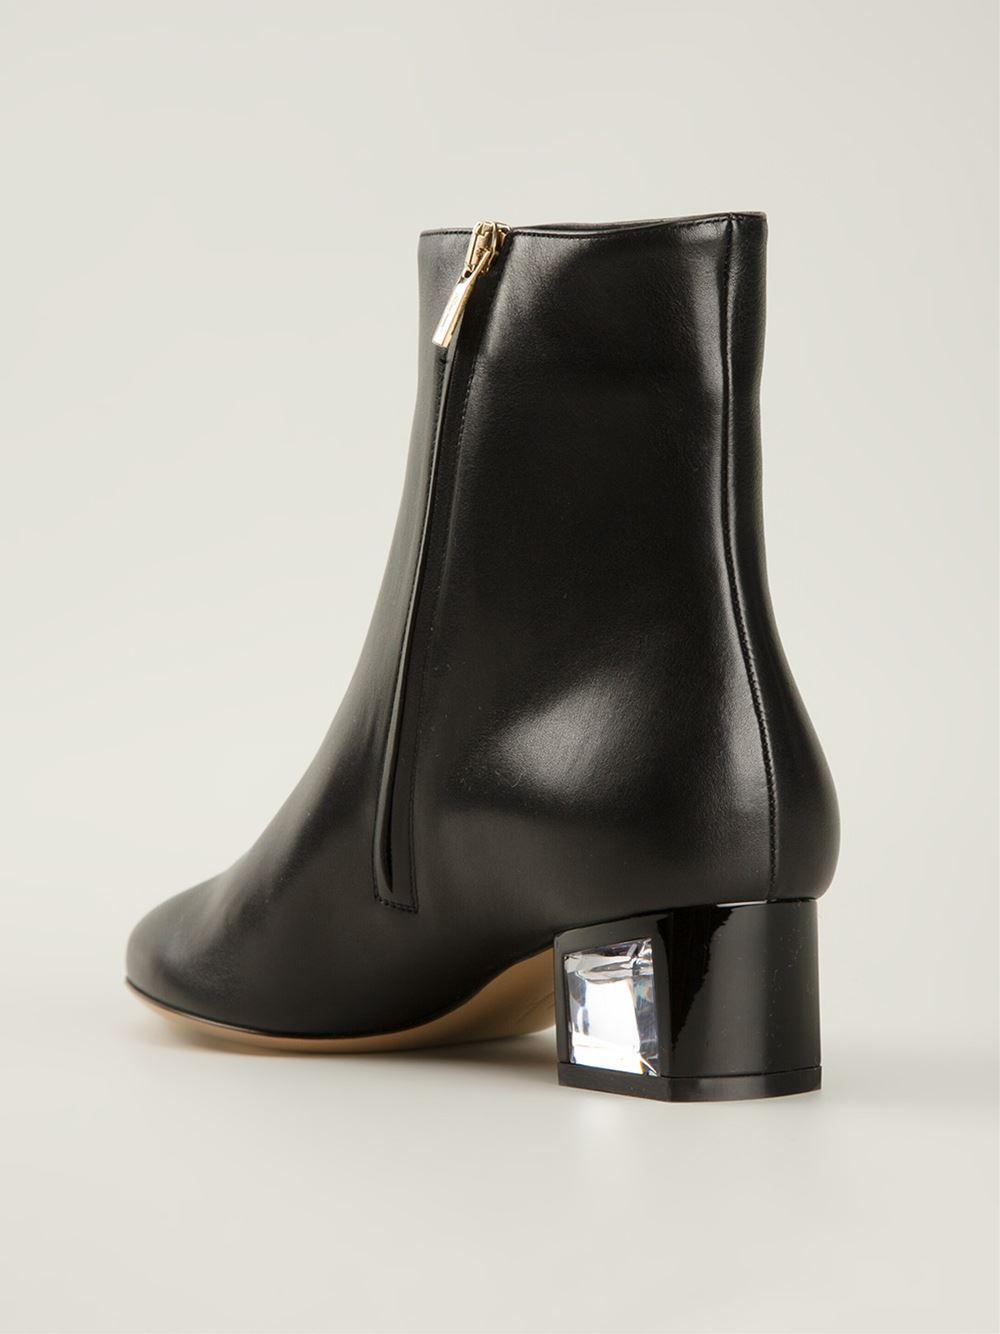 Ferragamo Block Heel Ankle Boots in Black